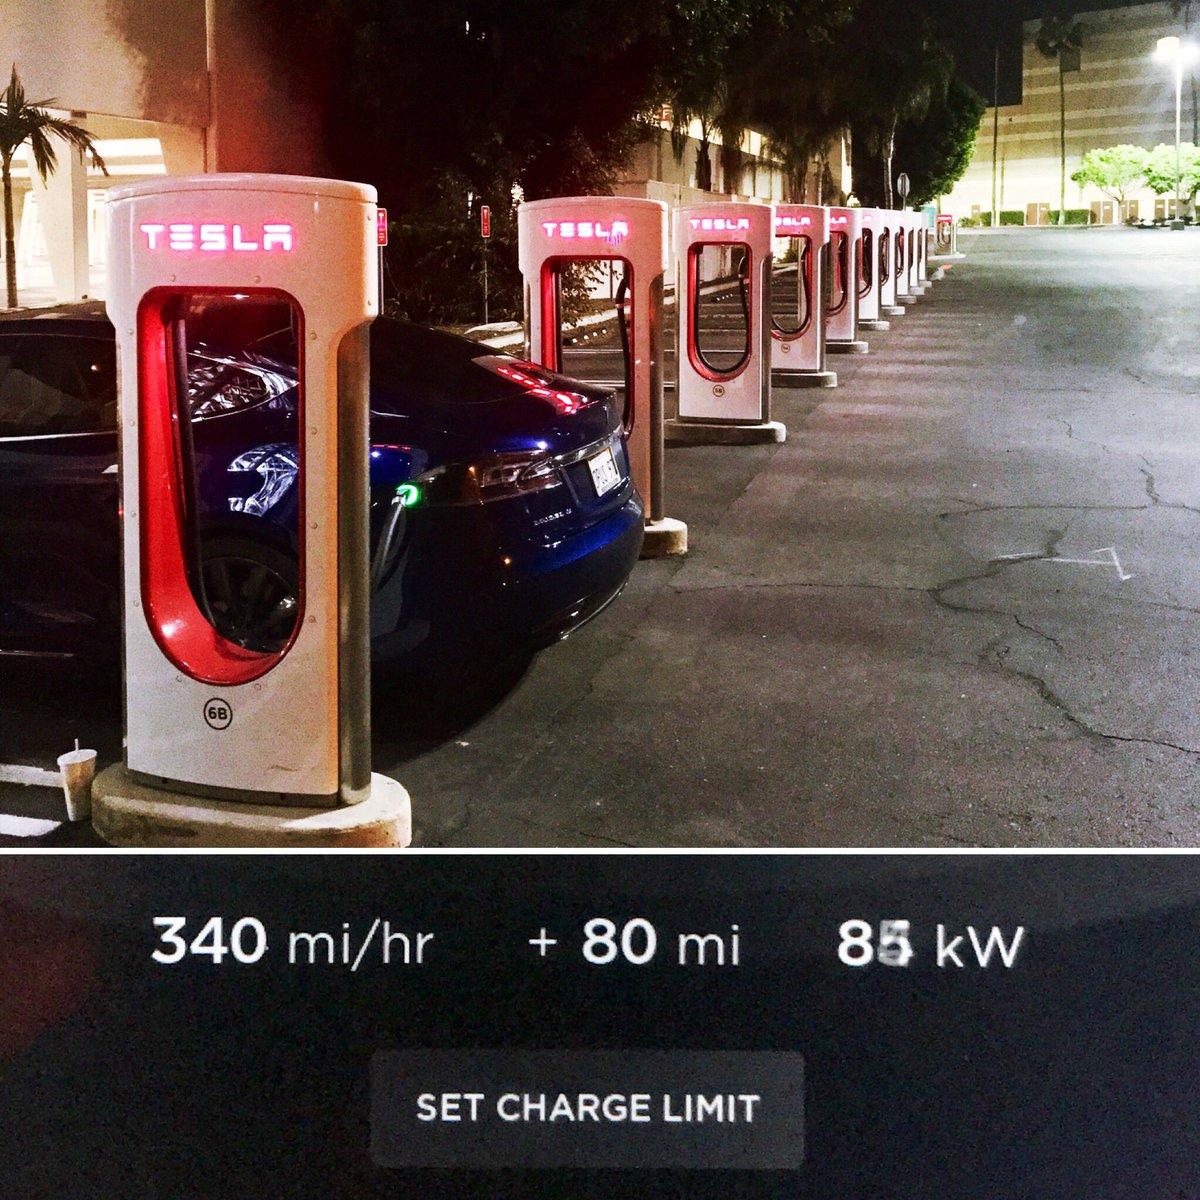 Tesla hookup